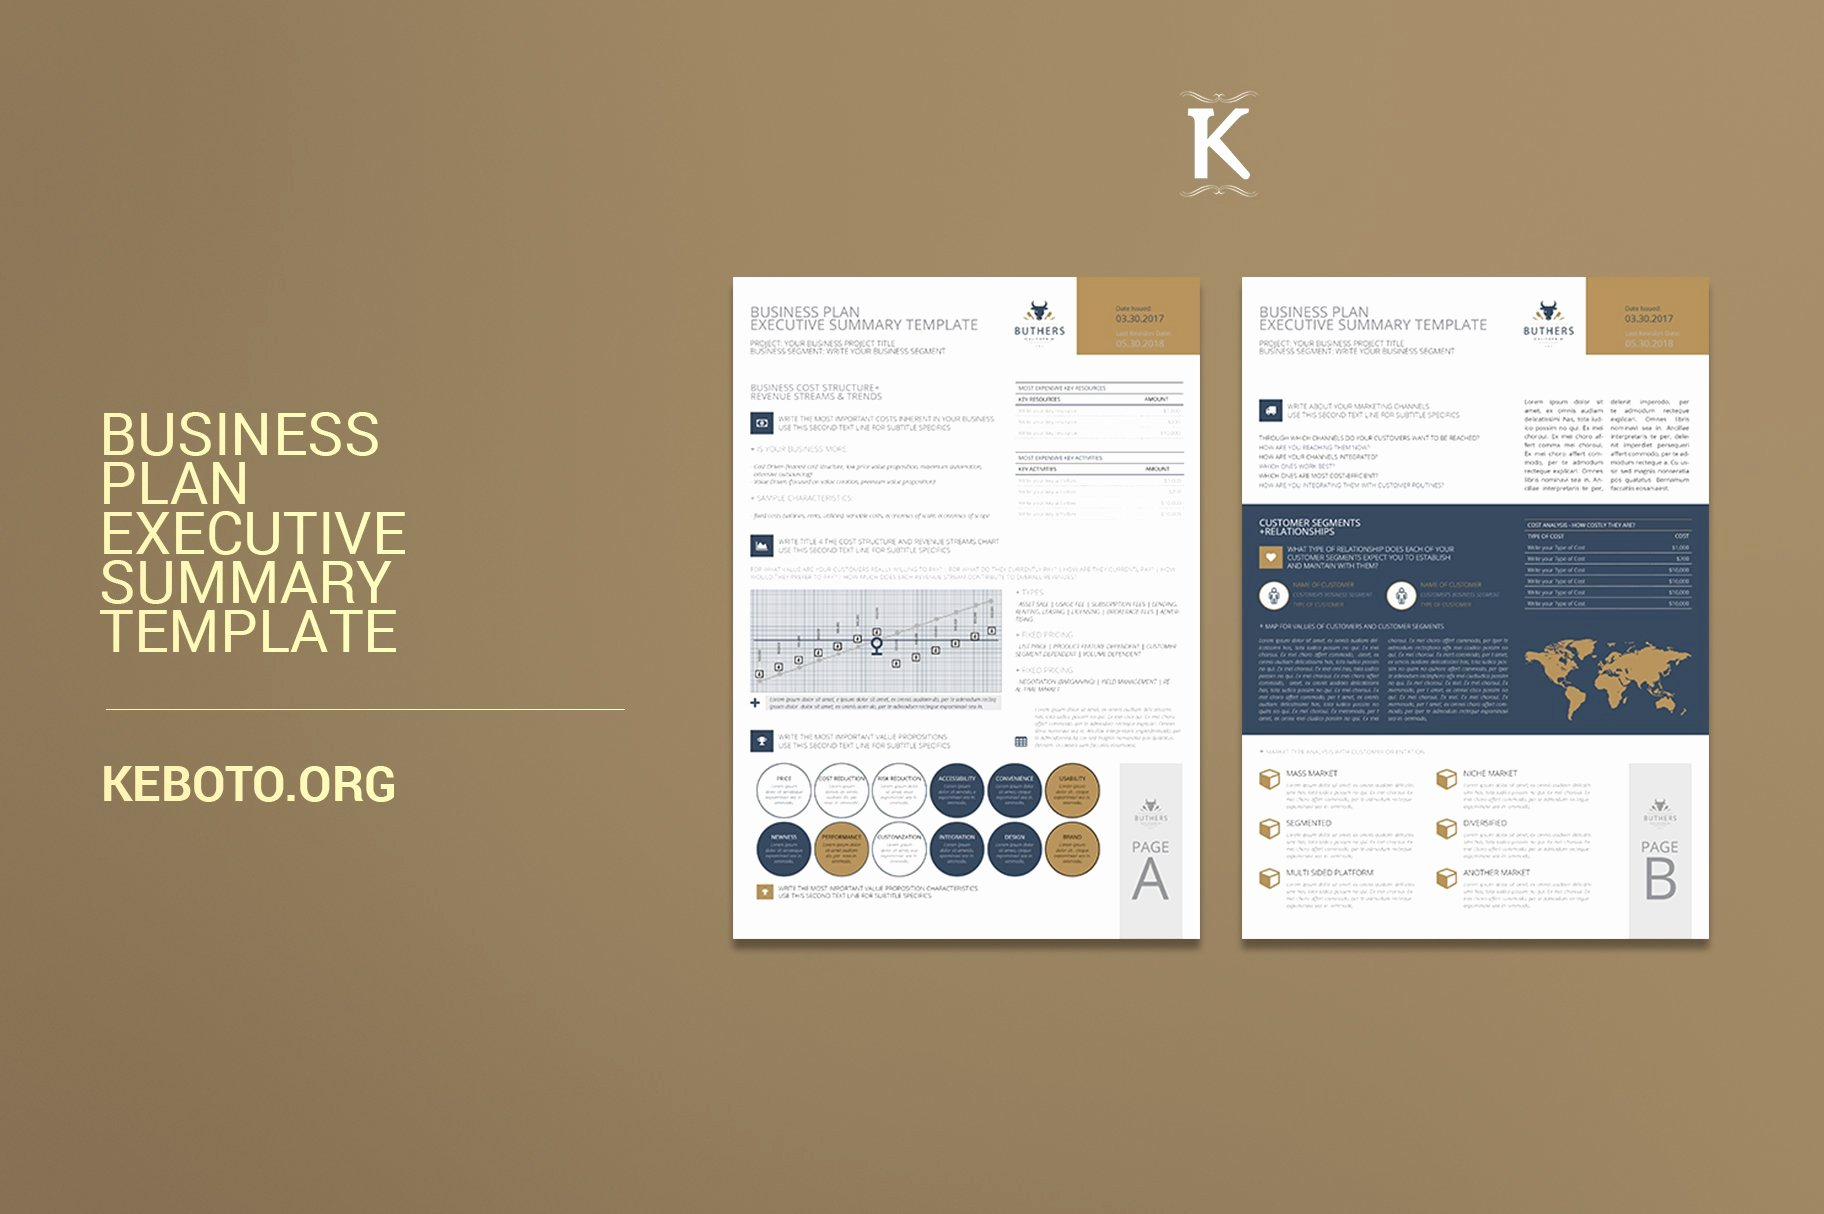 One Page Executive Summary Luxury Business Plan Executive Summary Templates Creative Market